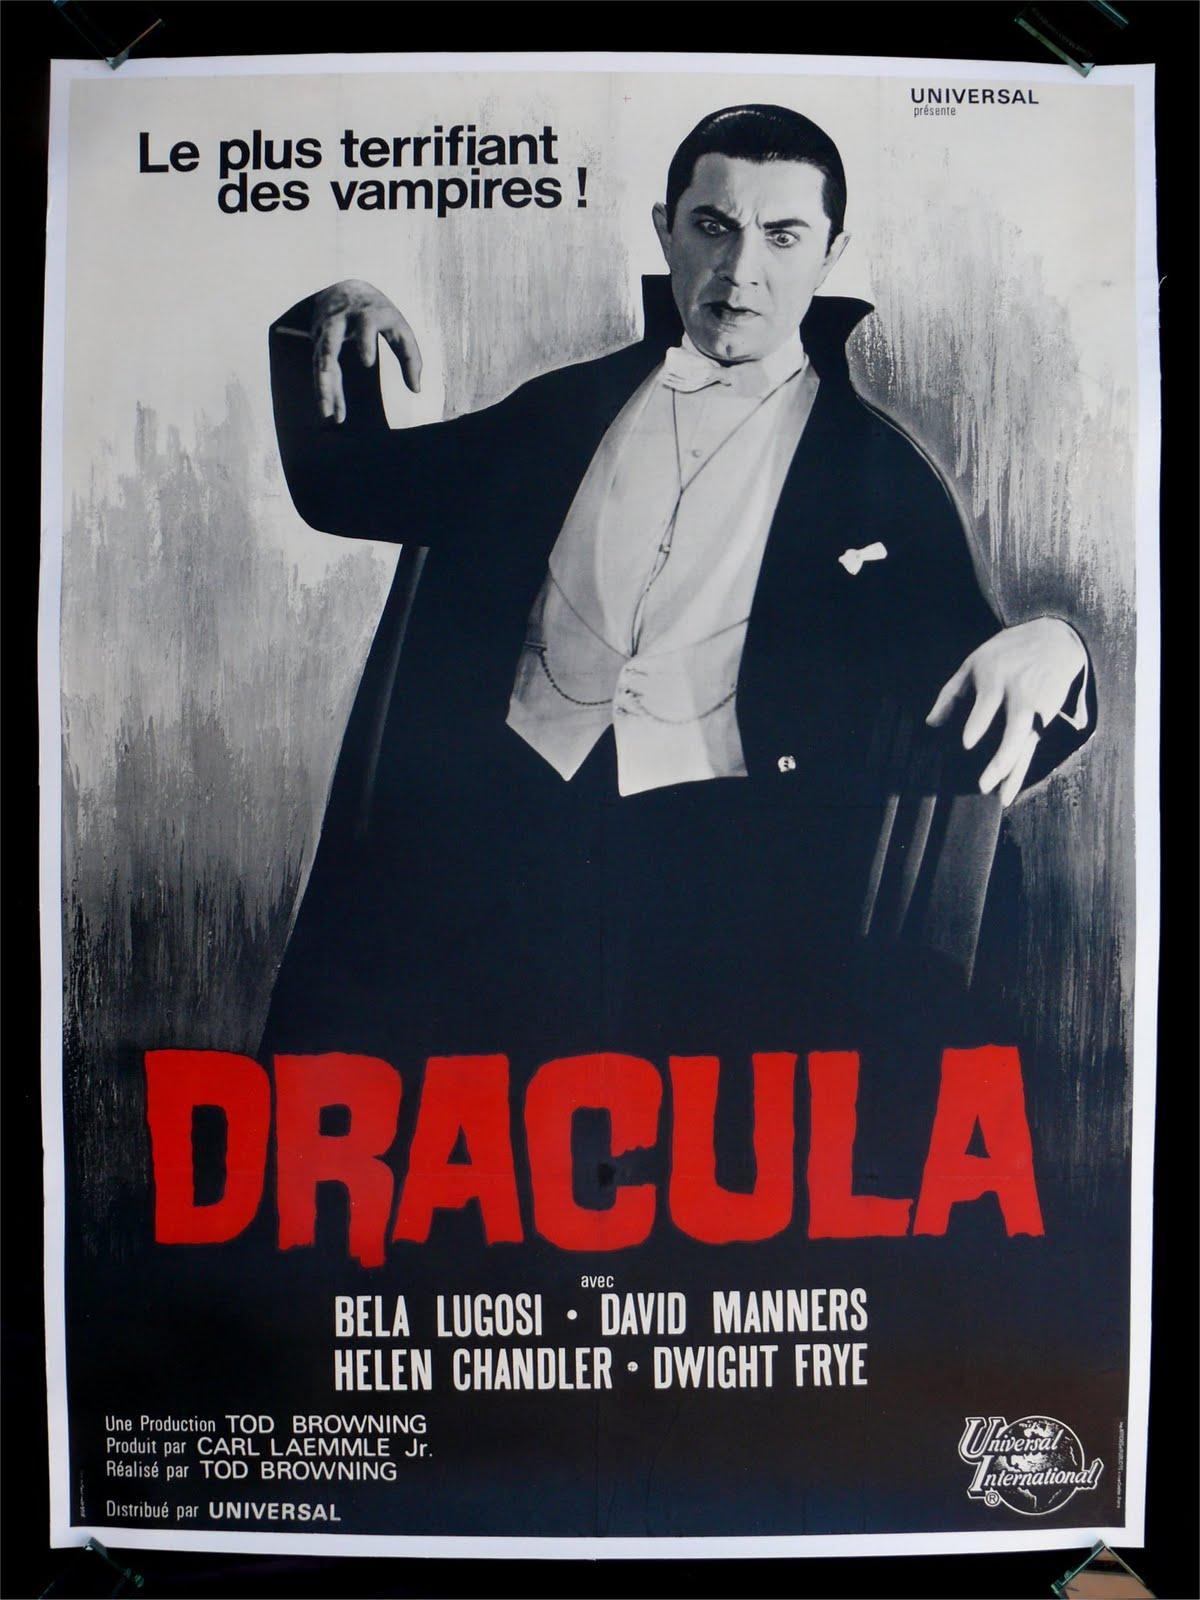 http://2.bp.blogspot.com/-YcaWClb8SF8/TlIp3IuBWCI/AAAAAAAAAj0/GHyIgSsCx7w/s1600/Dracula-movie-poster.jpg